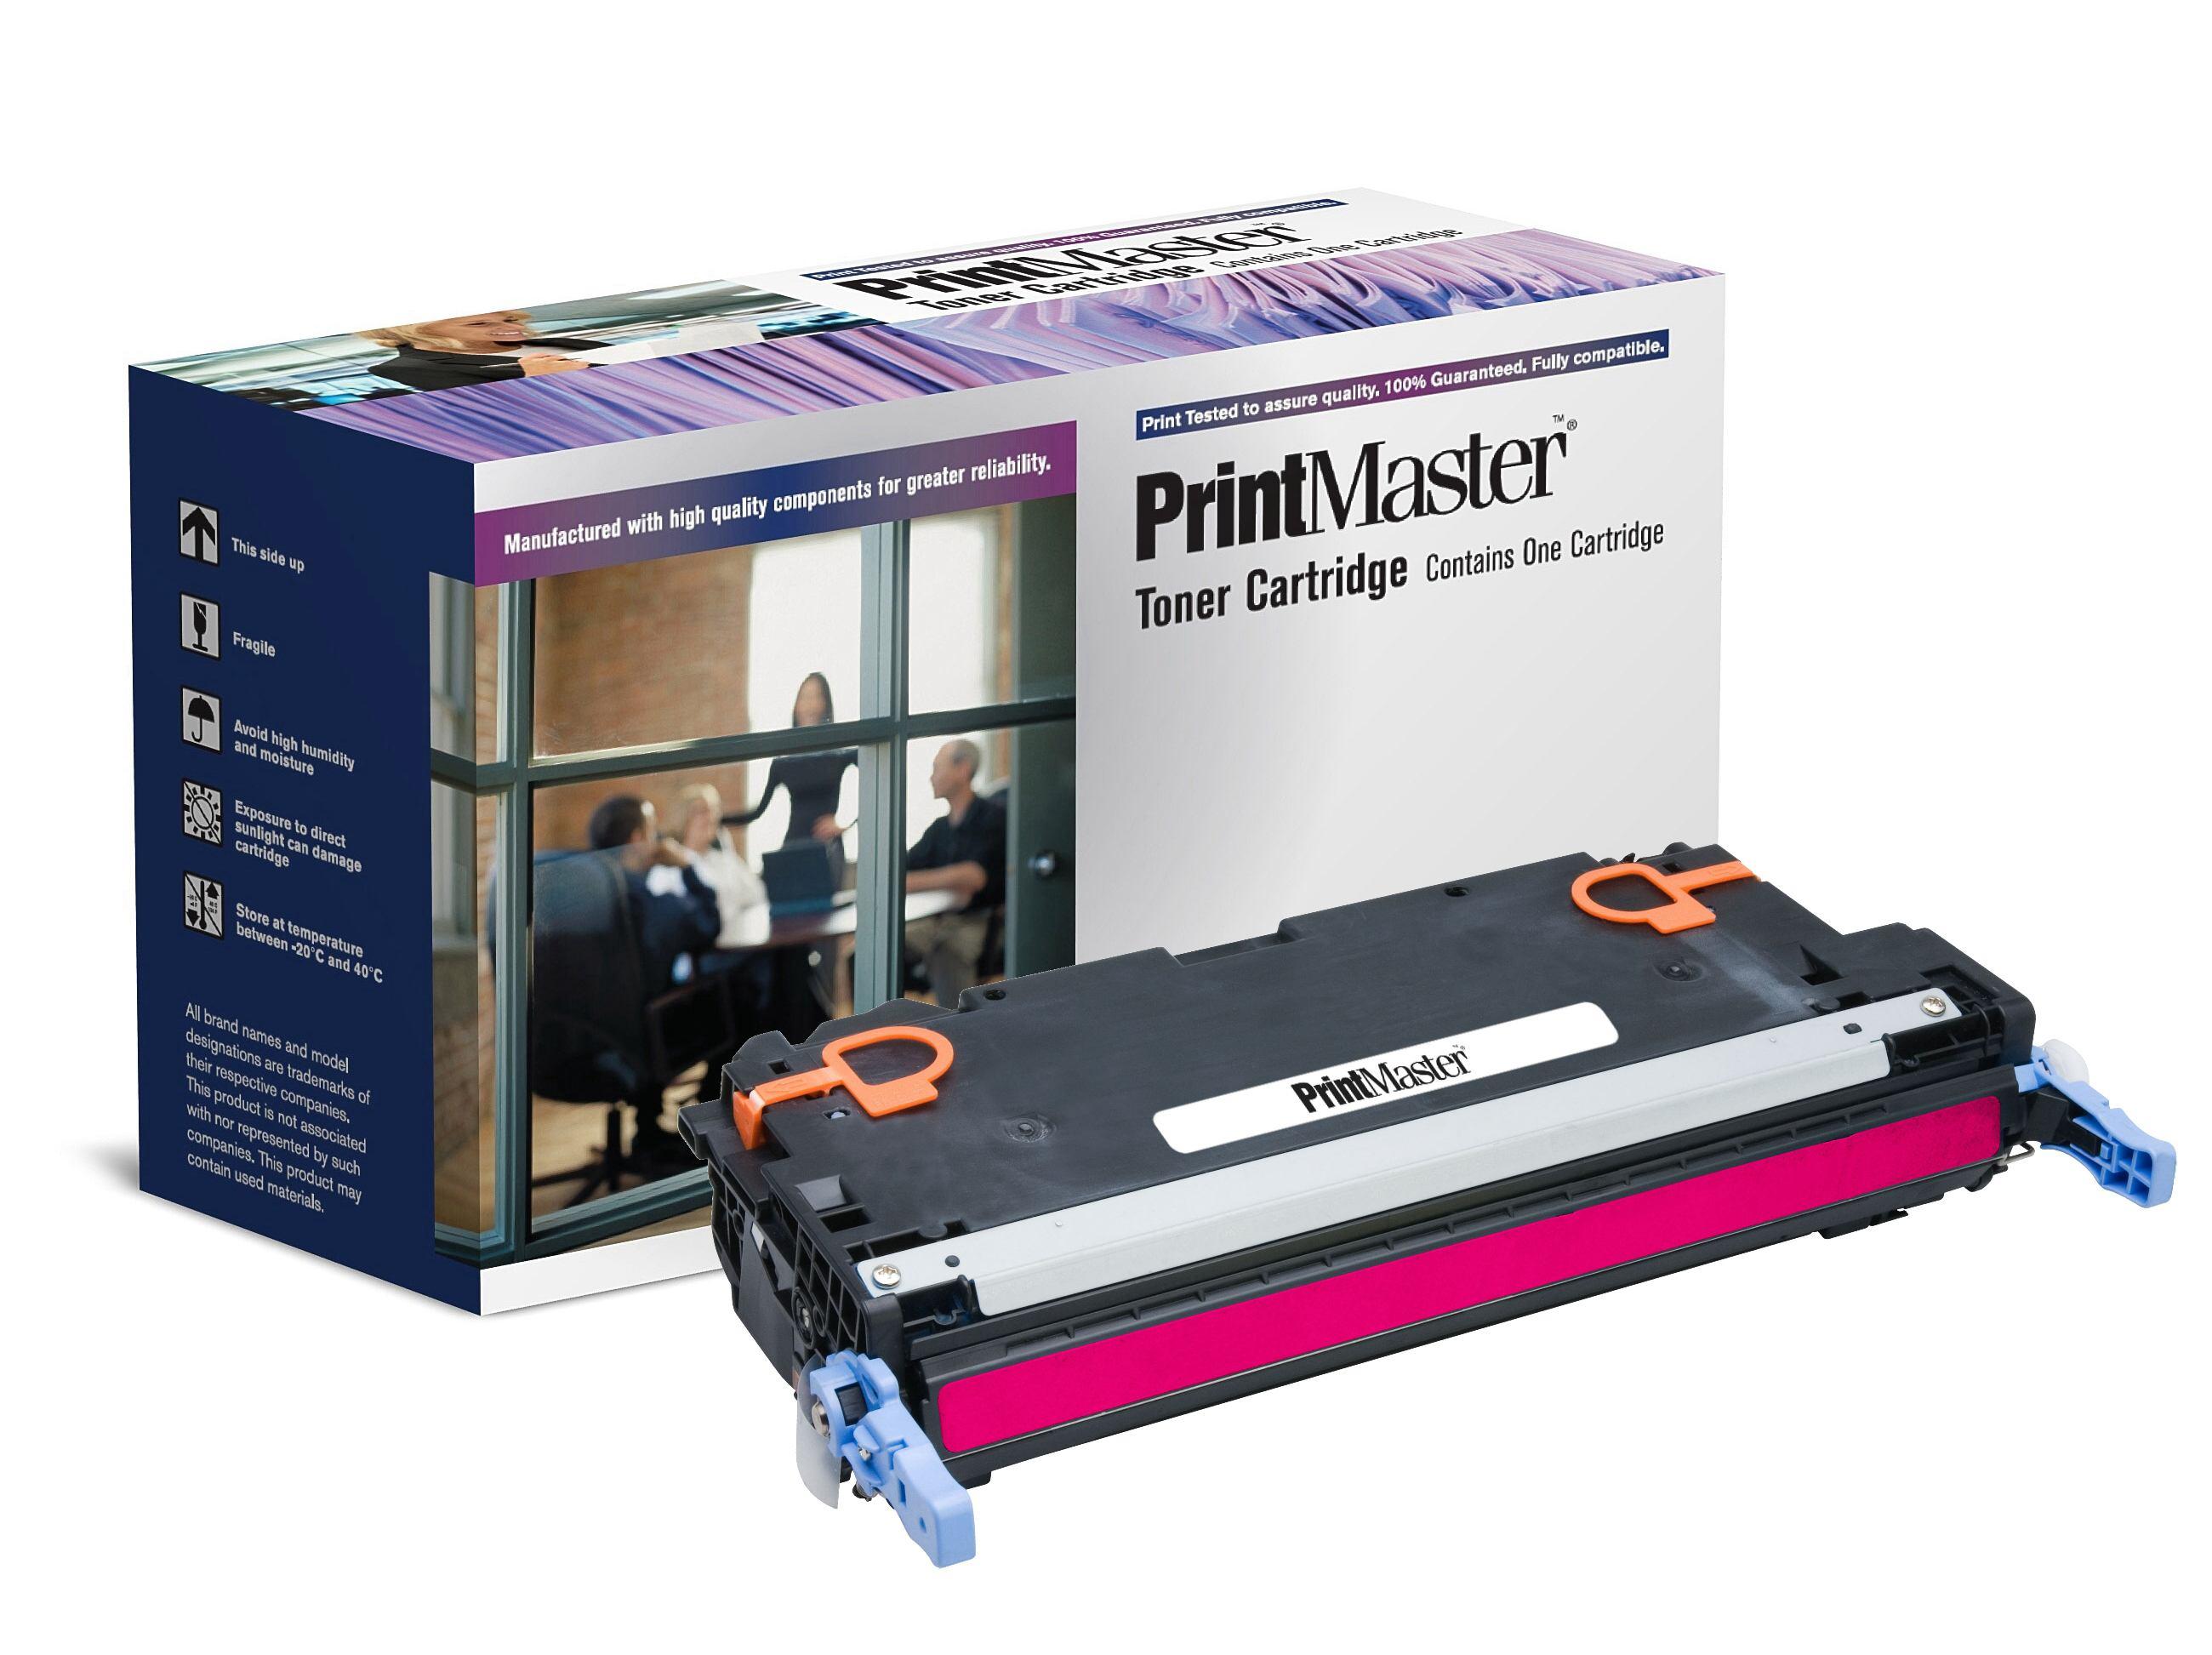 PrintMaster HP LaserJet 3800 Mag 6K Q7583A